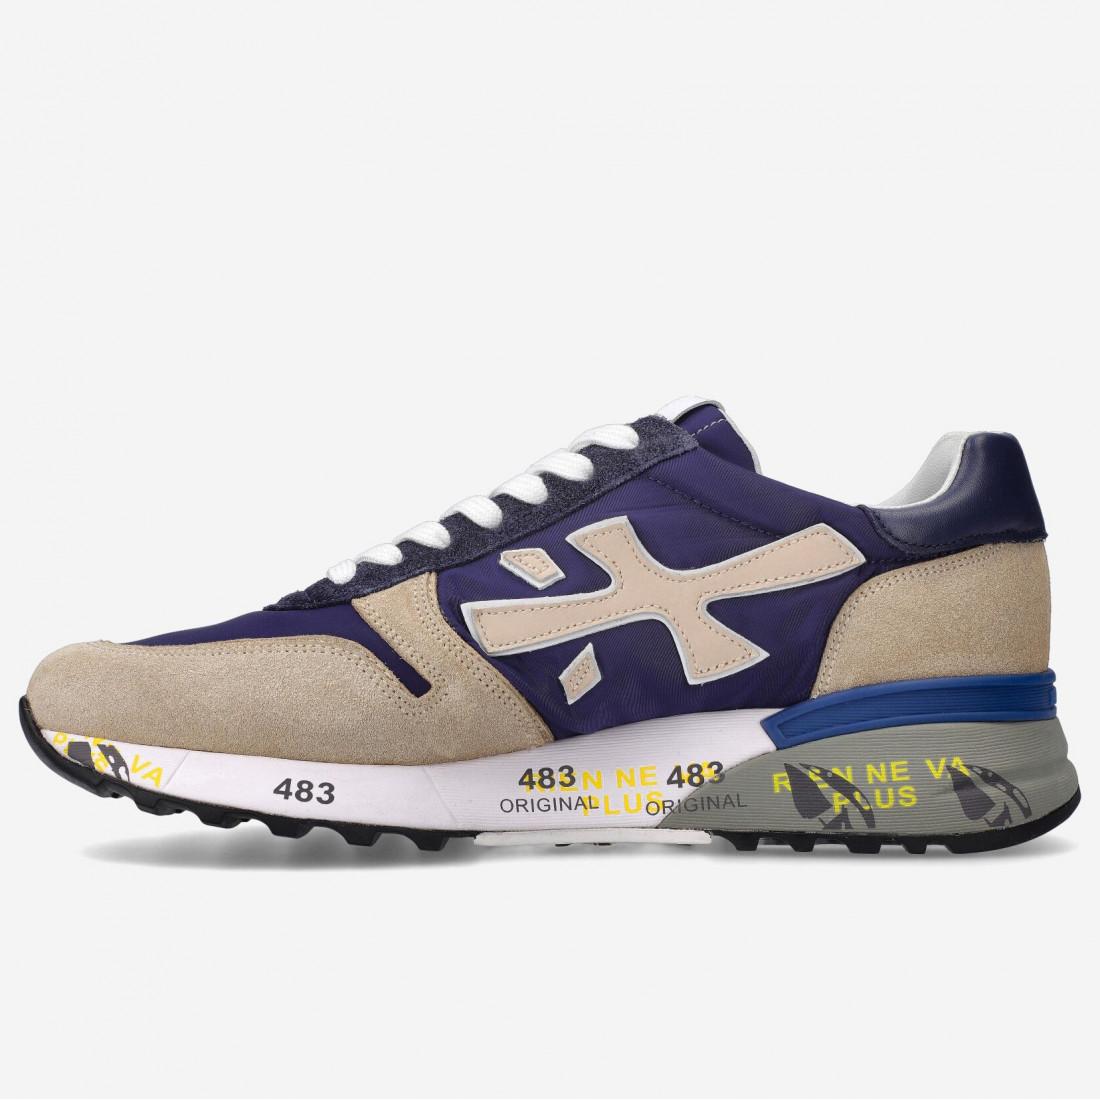 sneakers uomo premiata mick5187 8282